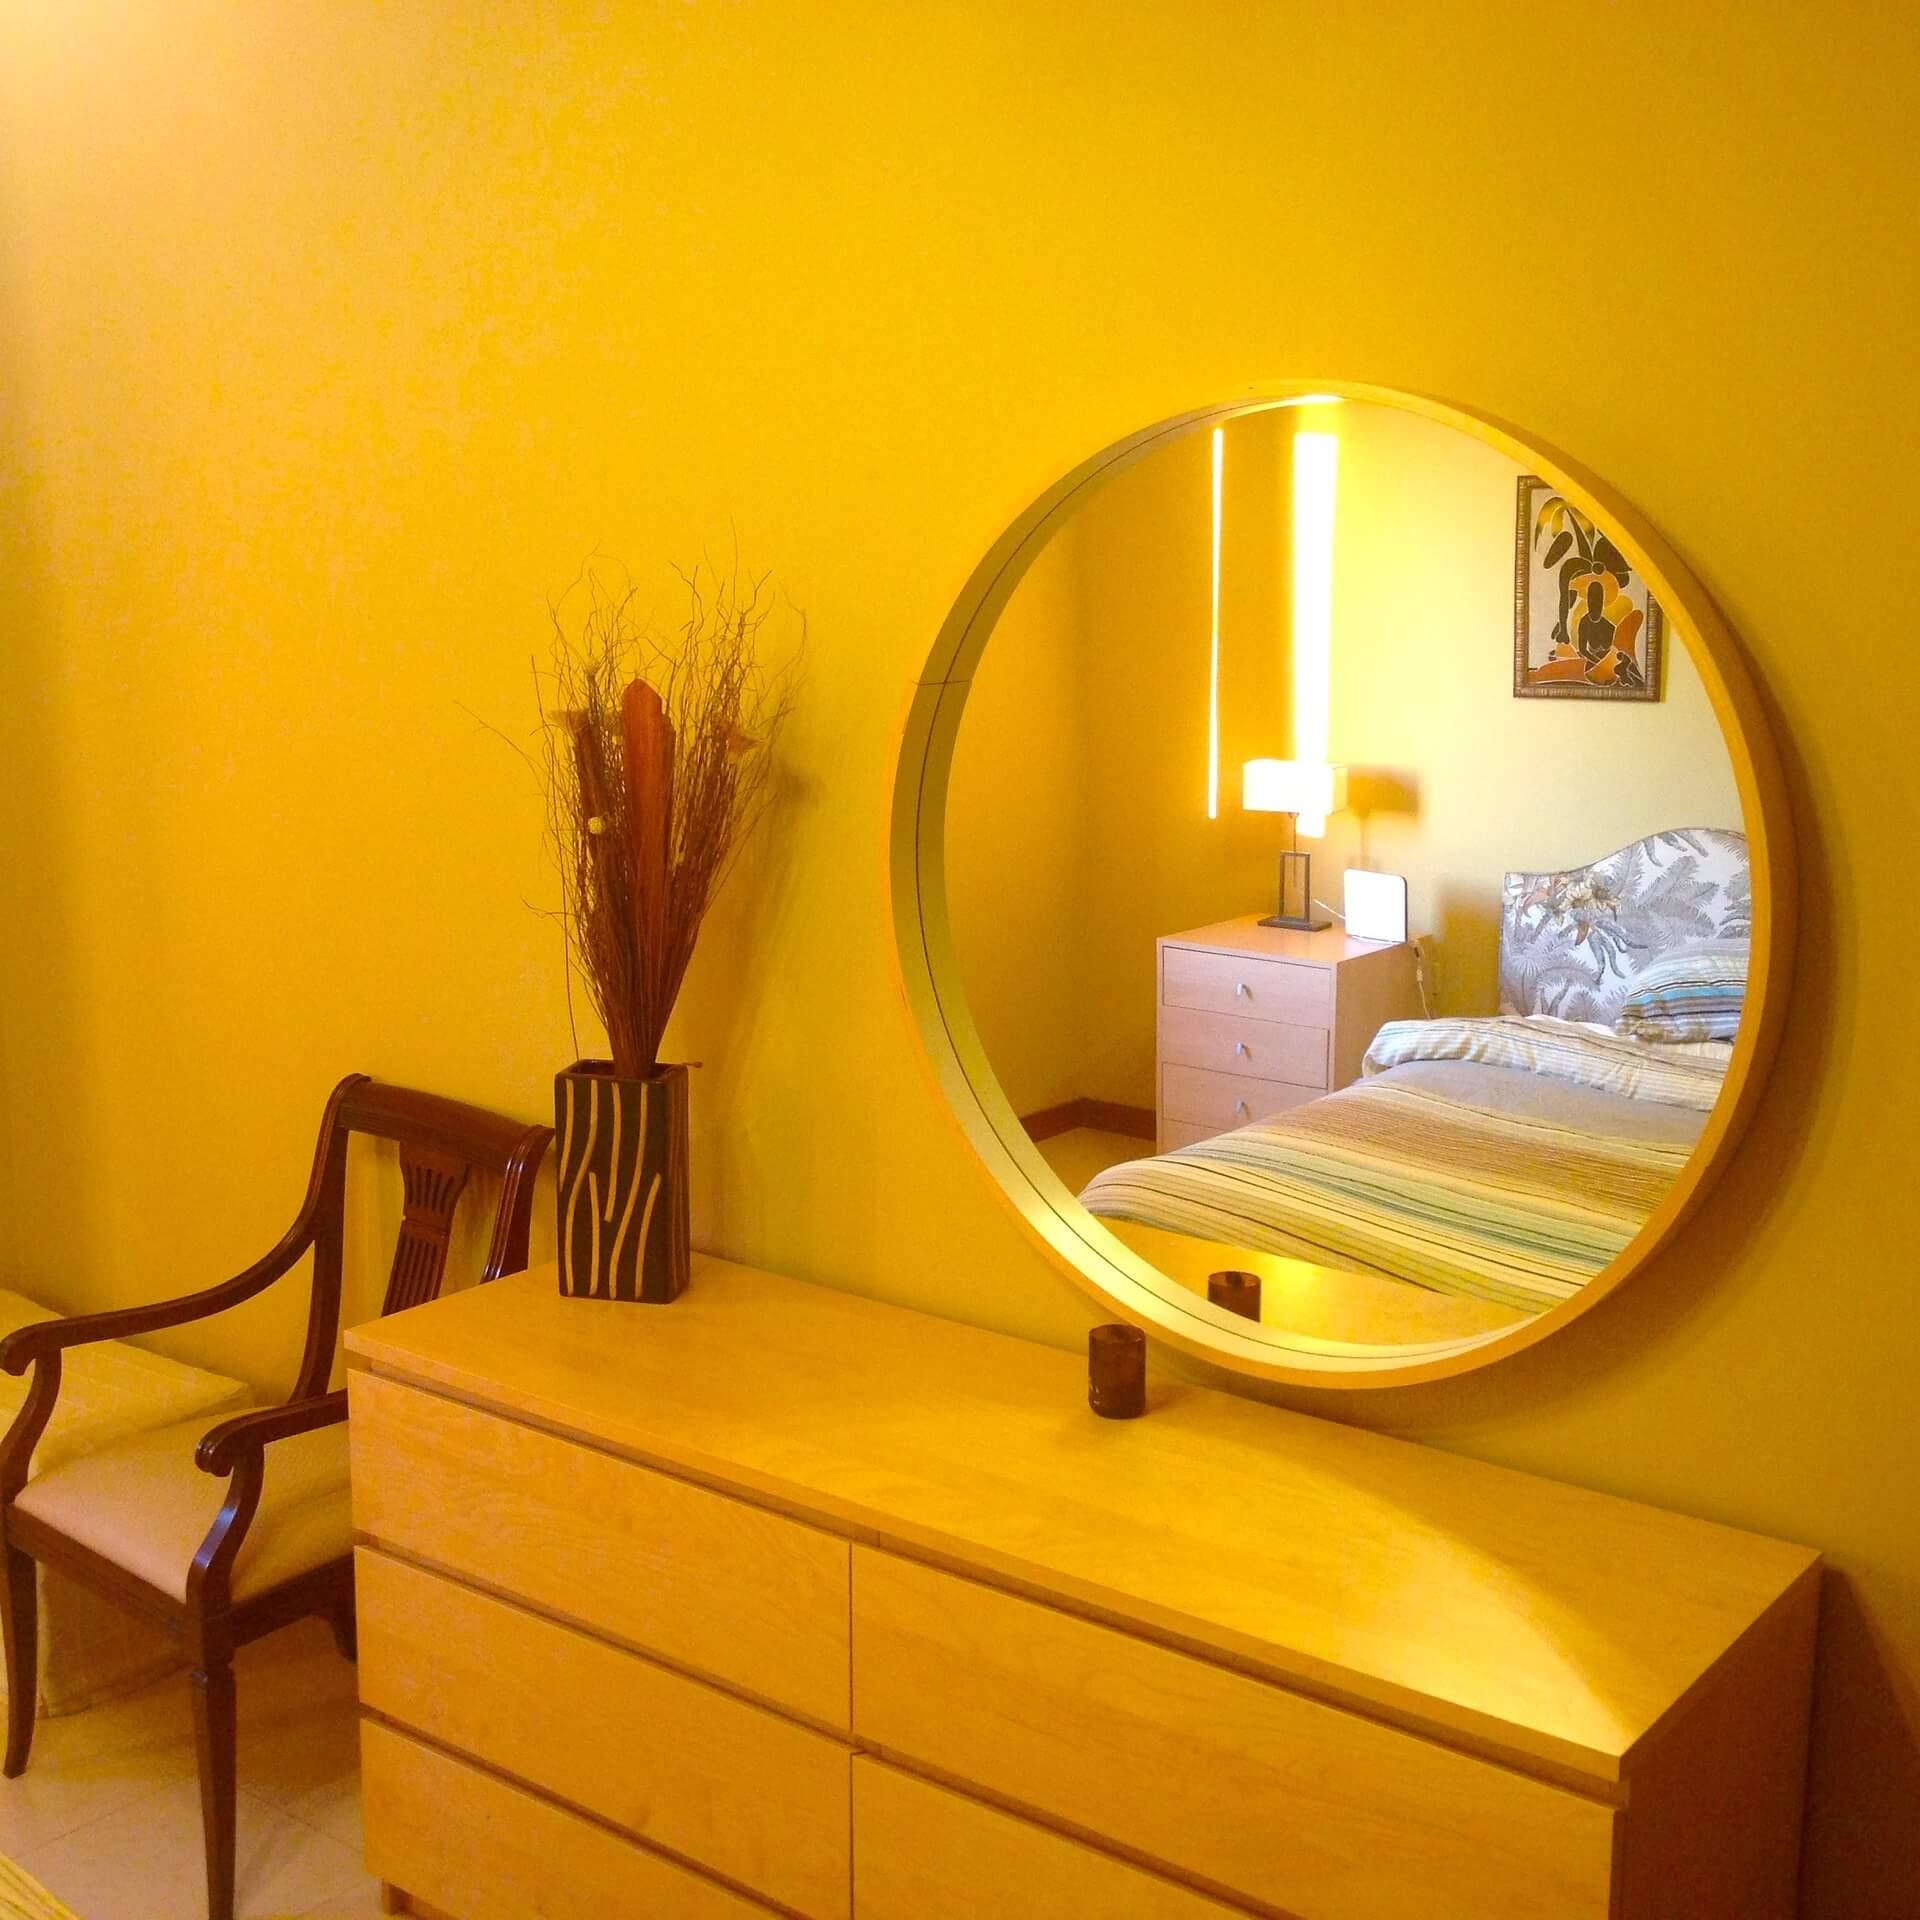 Mirrors: Our Flexible Friend